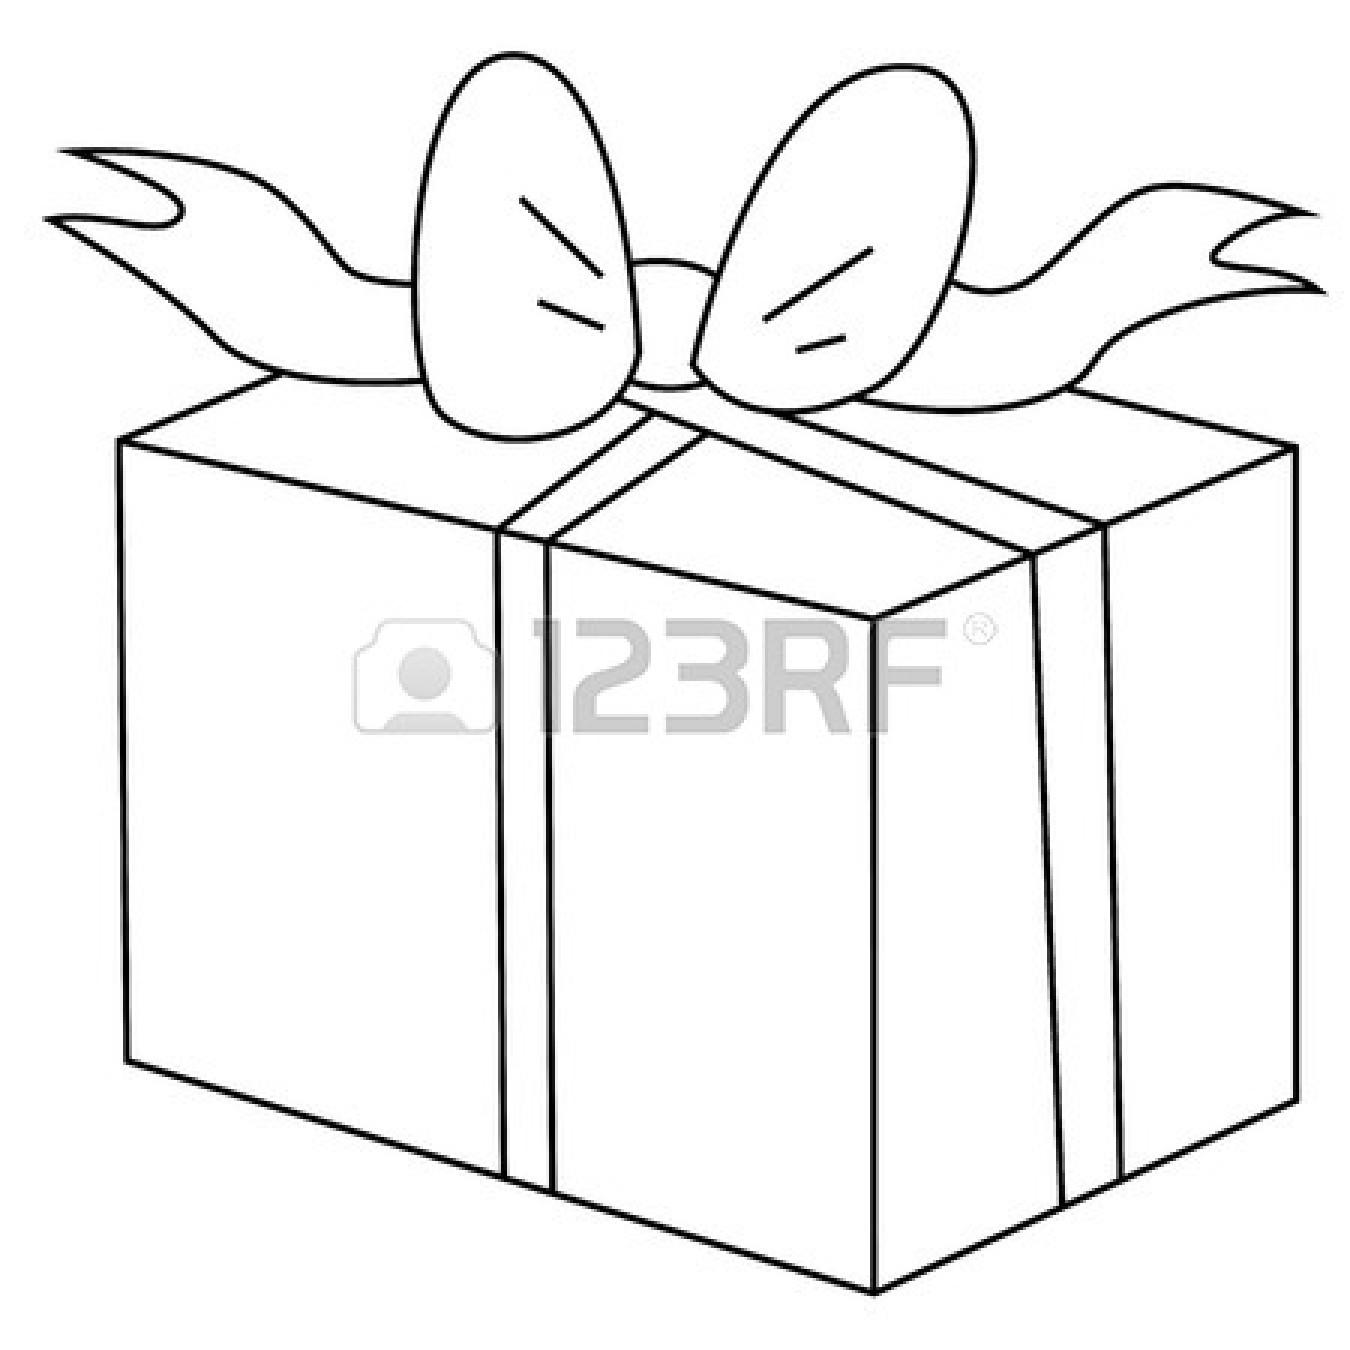 1350x1350 Black And White Present Clipart